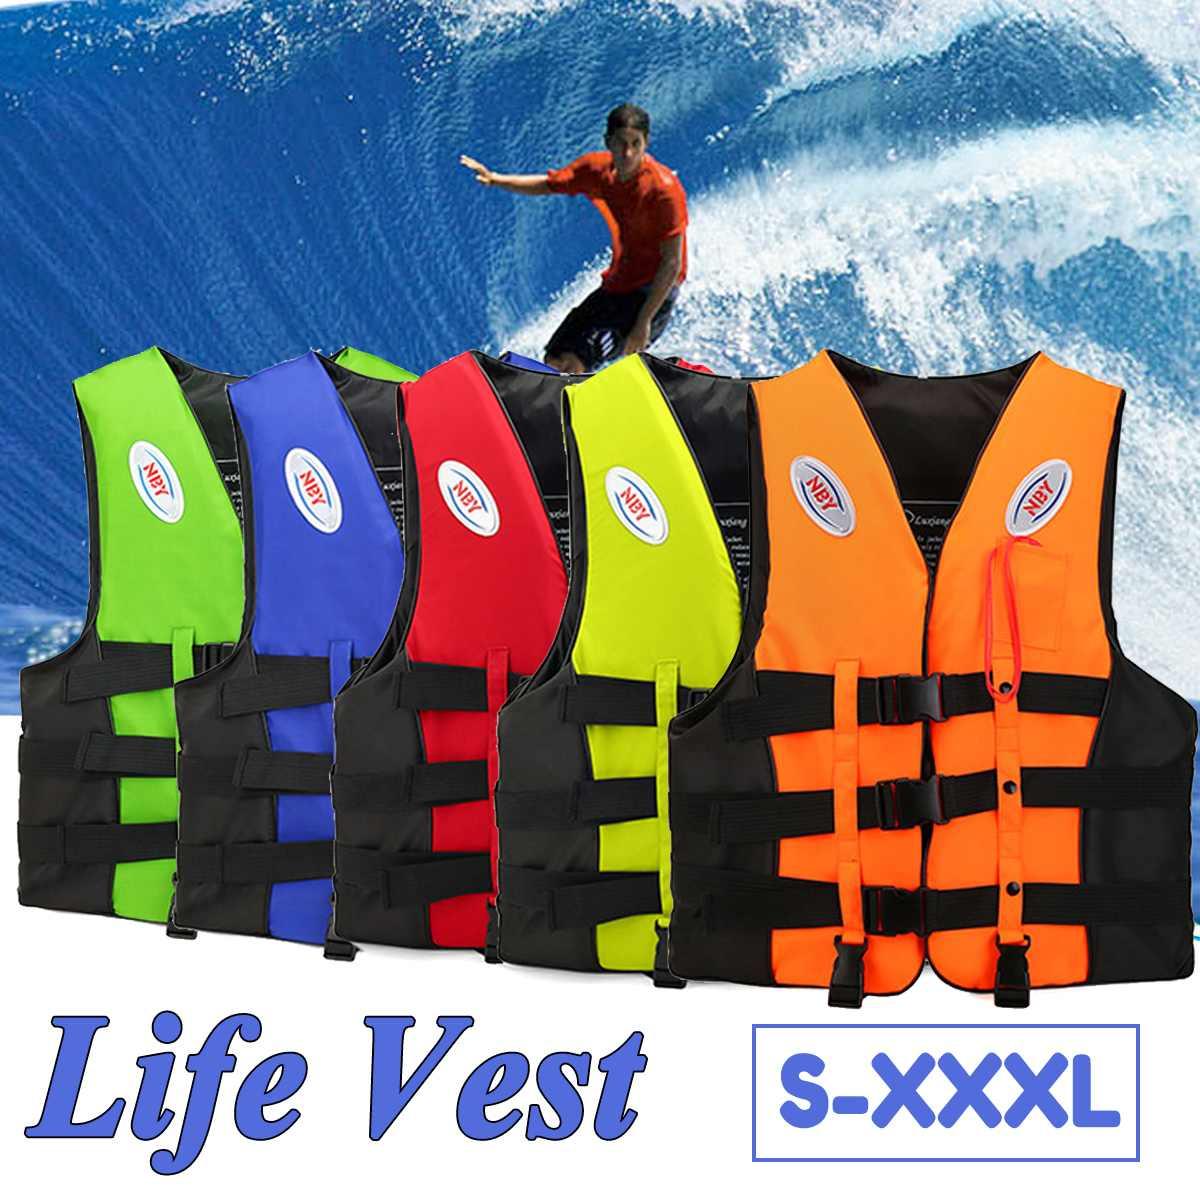 Polyester Adult kids Life Vest Jacket Swimming Boating Ski Drifting Life Vest S-XXXL Sizes Water Sports Man Jacket Wear Fishing